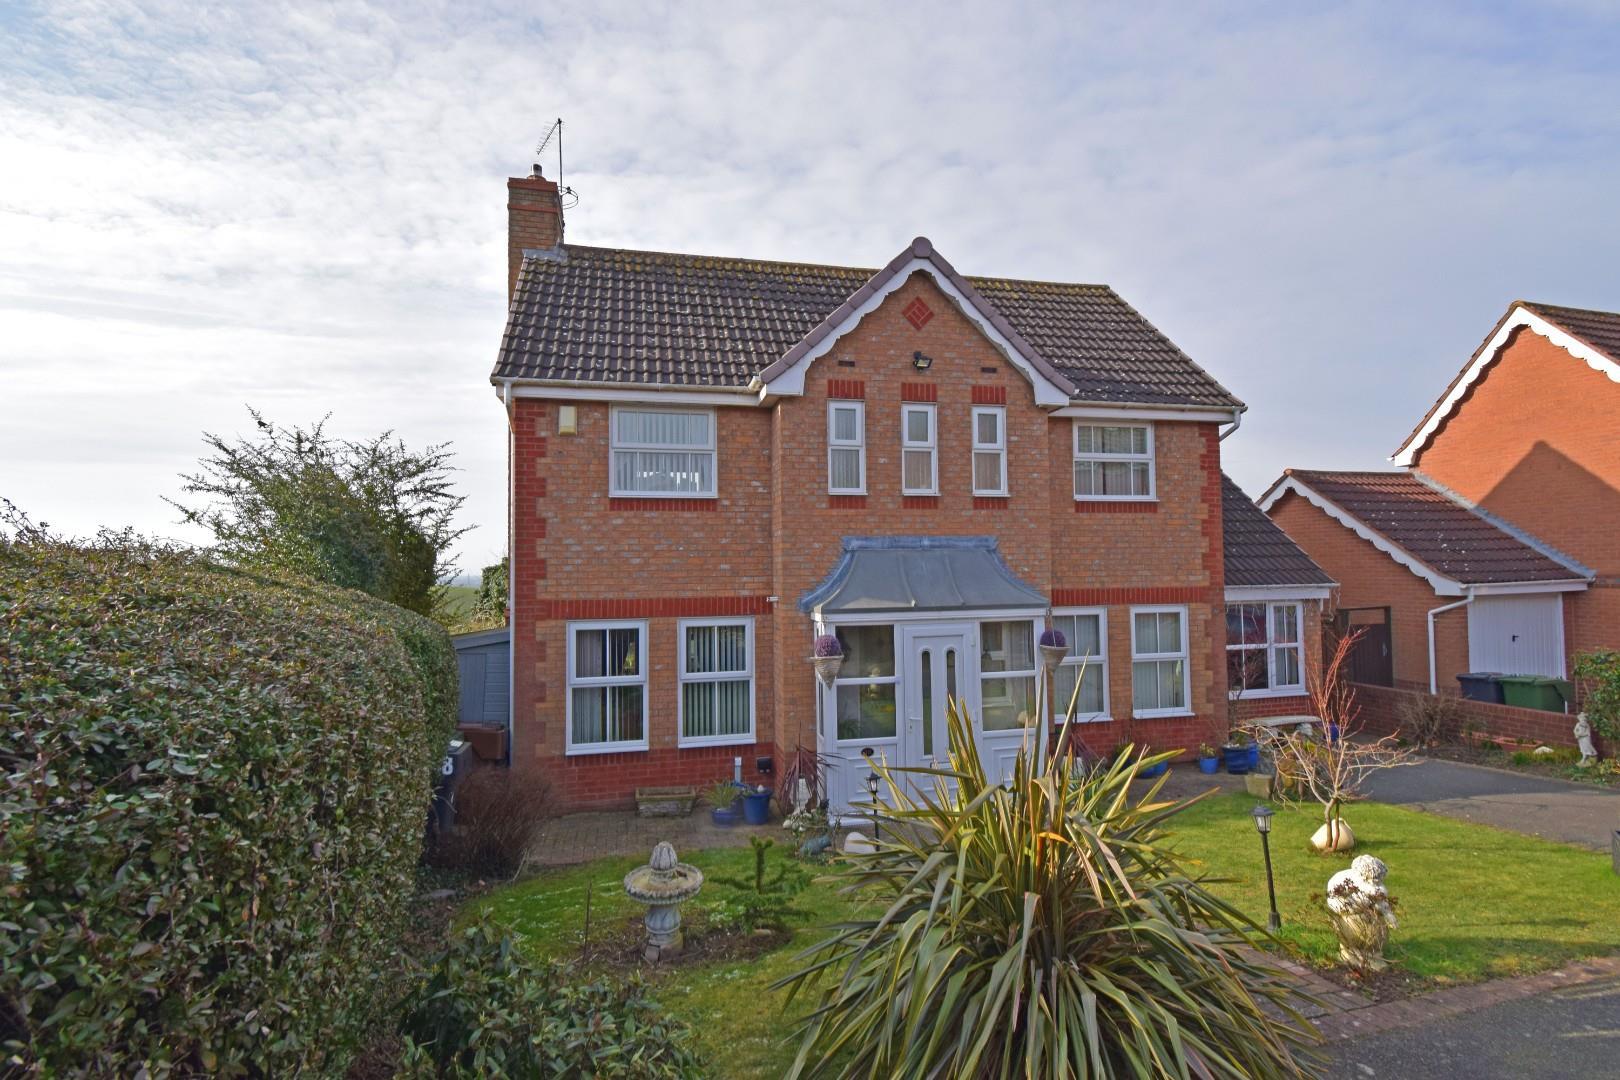 48 Parkstone Avenue, Hilltop, Bromsgrove, Worcestershire, B61 7NS